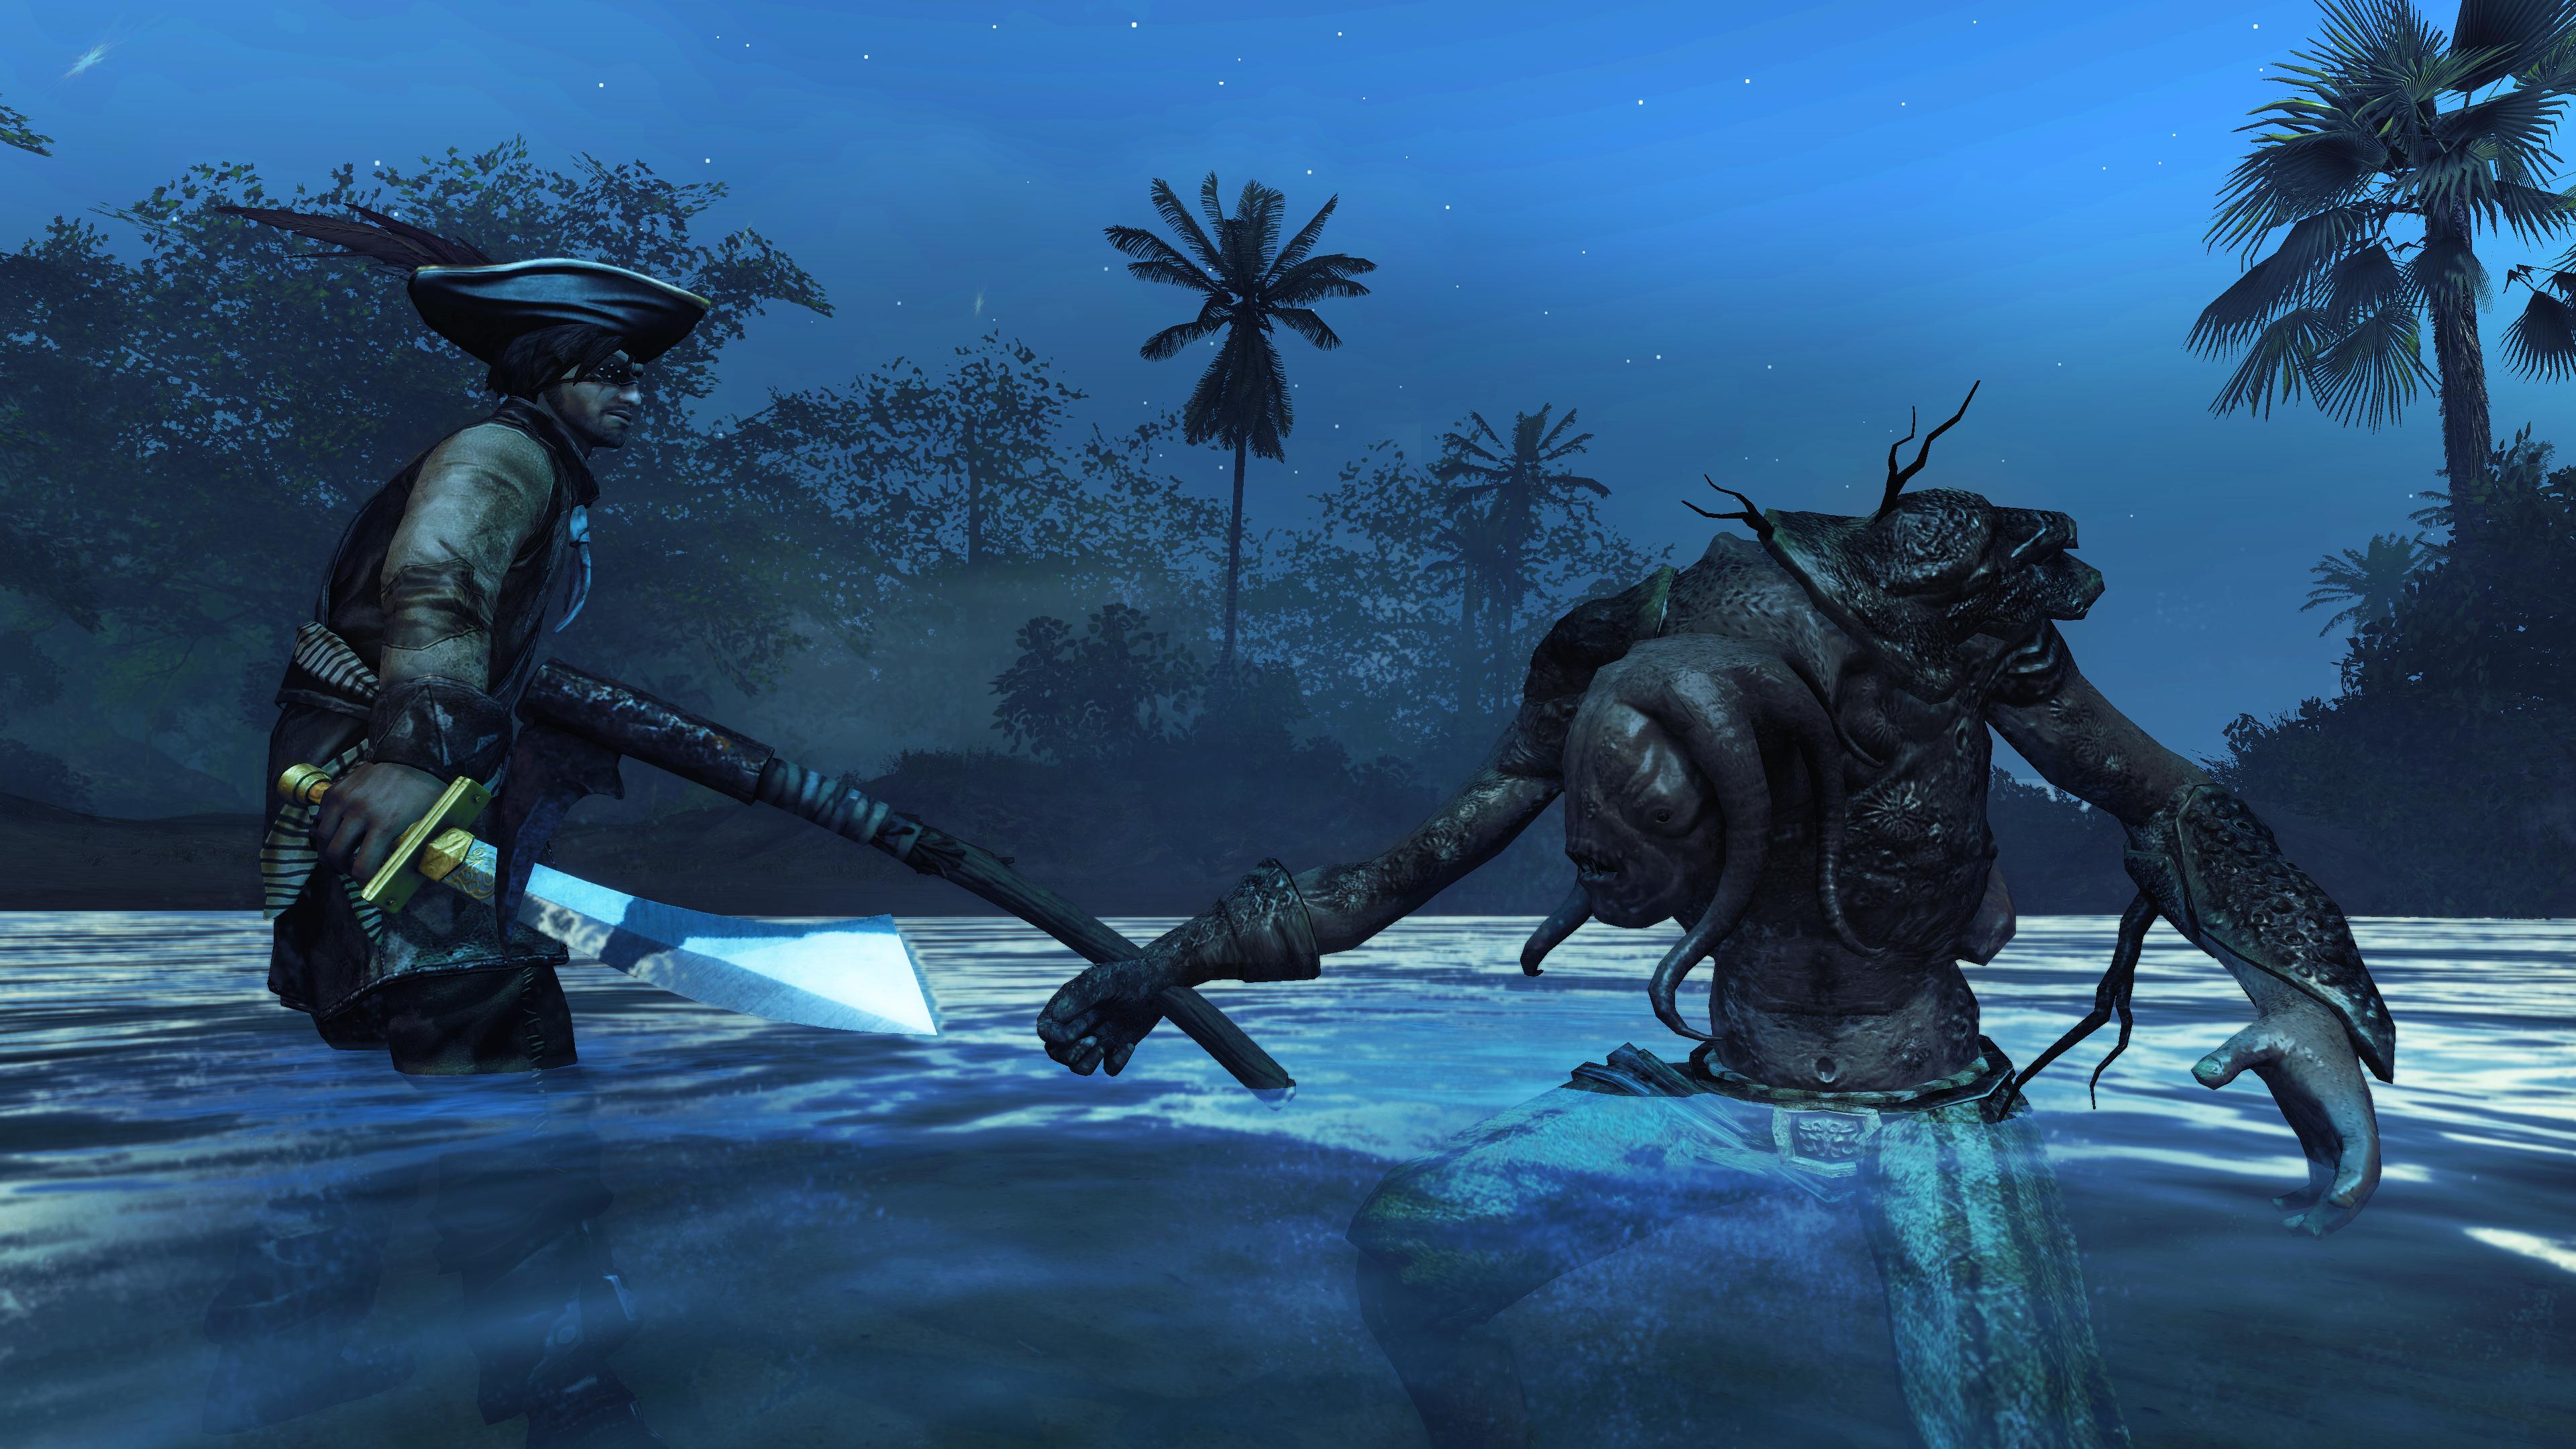 Risen 2: Dark Waters - A Pirate's Clothes DLC screenshot